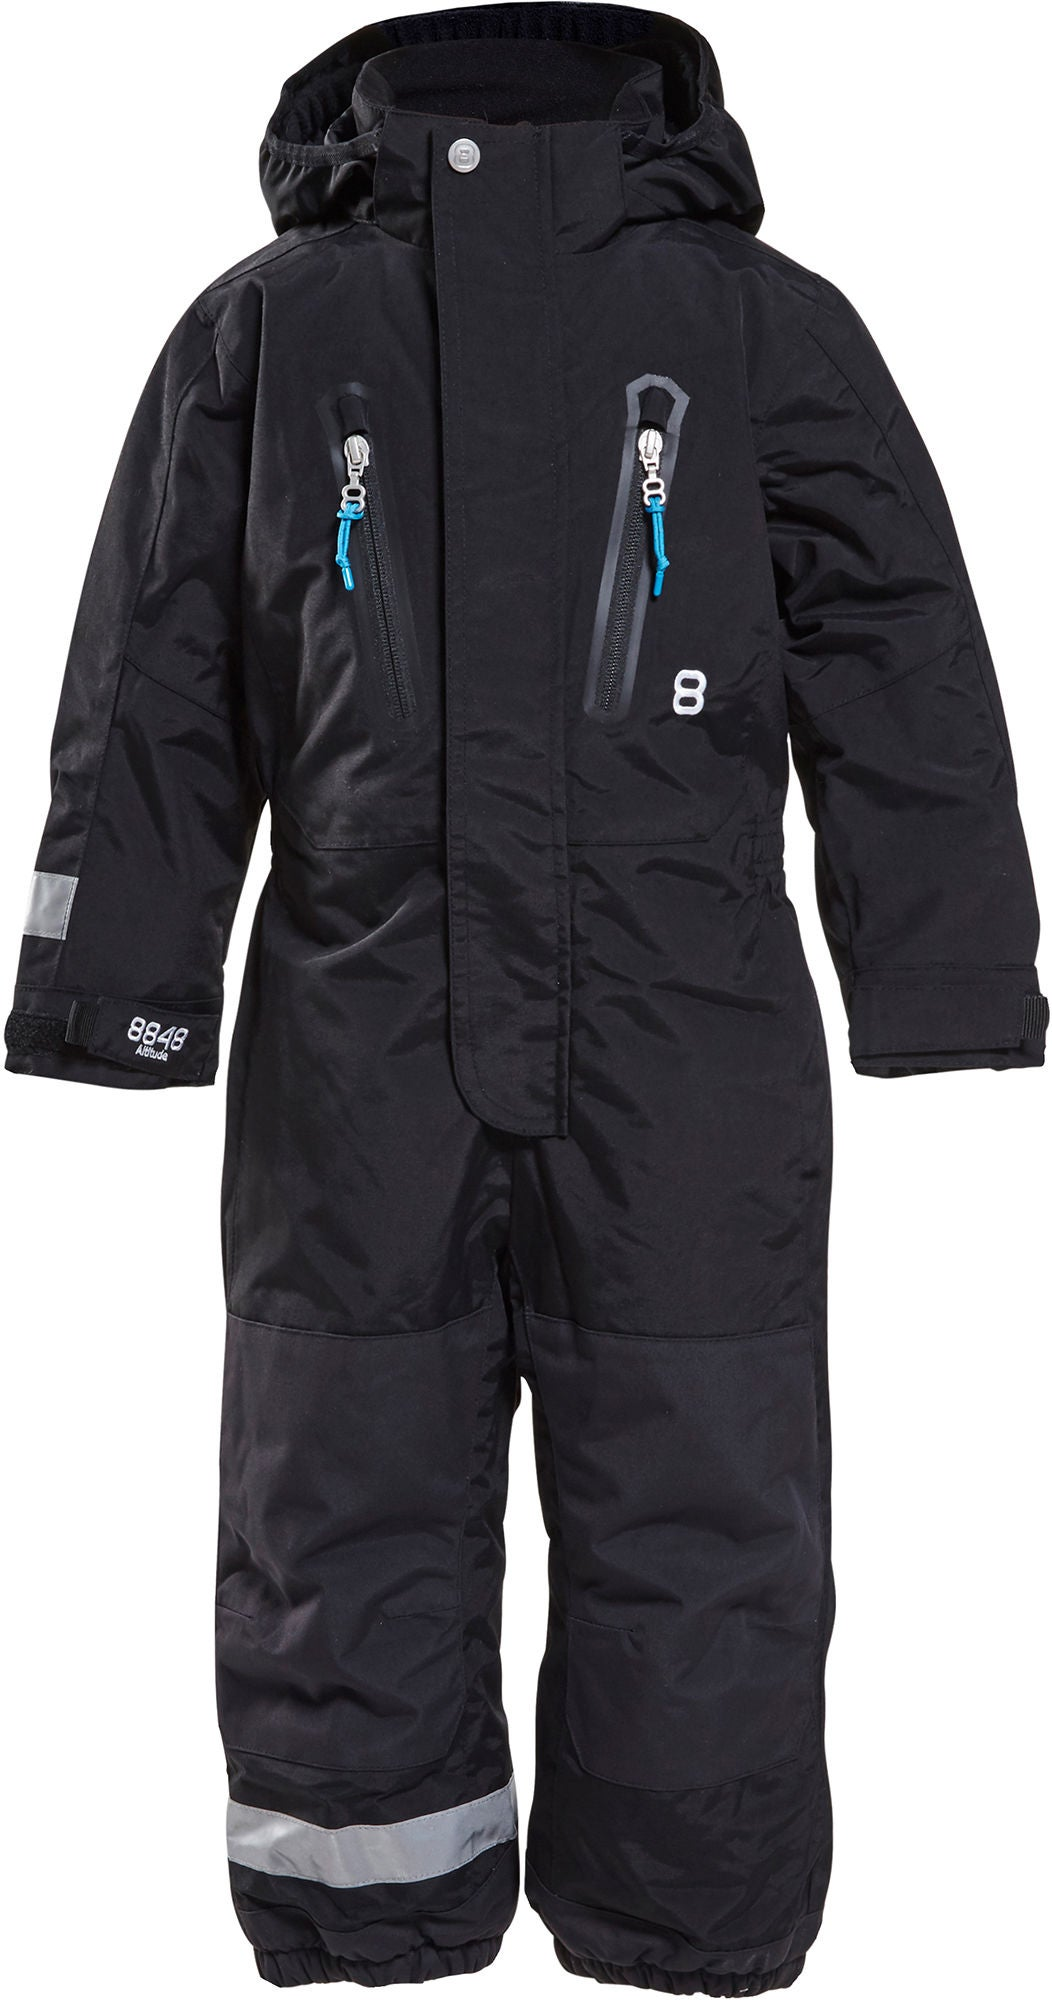 8848 Altitude Karel Min Overall, Black 90